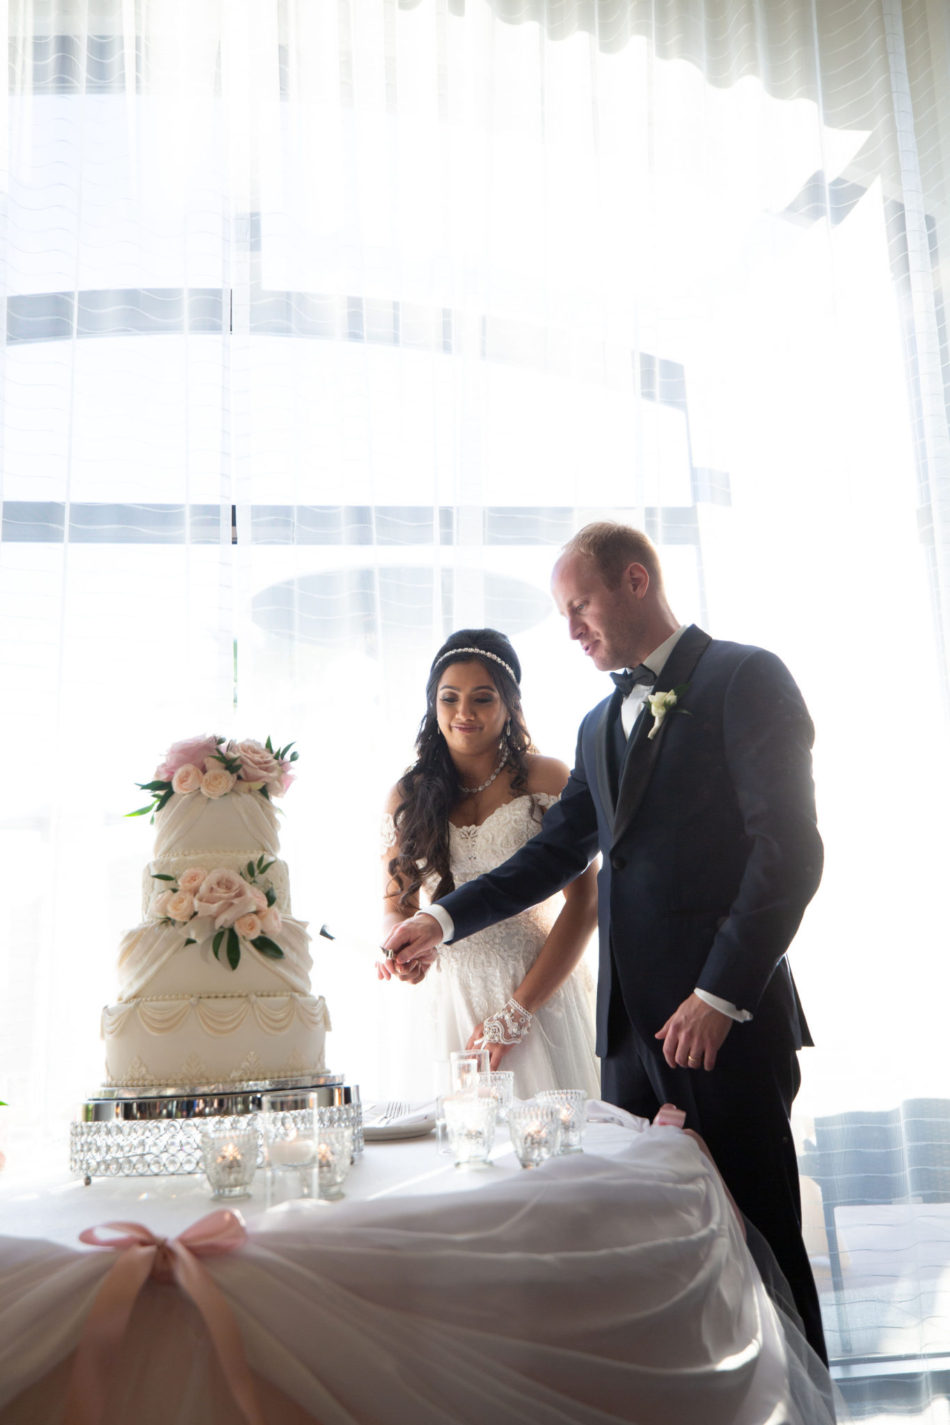 wedding cake, floral cake decor, cake cutting,floral design, florist, wedding florist, wedding flowers, orange county weddings, orange county wedding florist, orange county florist, orange county floral design, flowers by cina